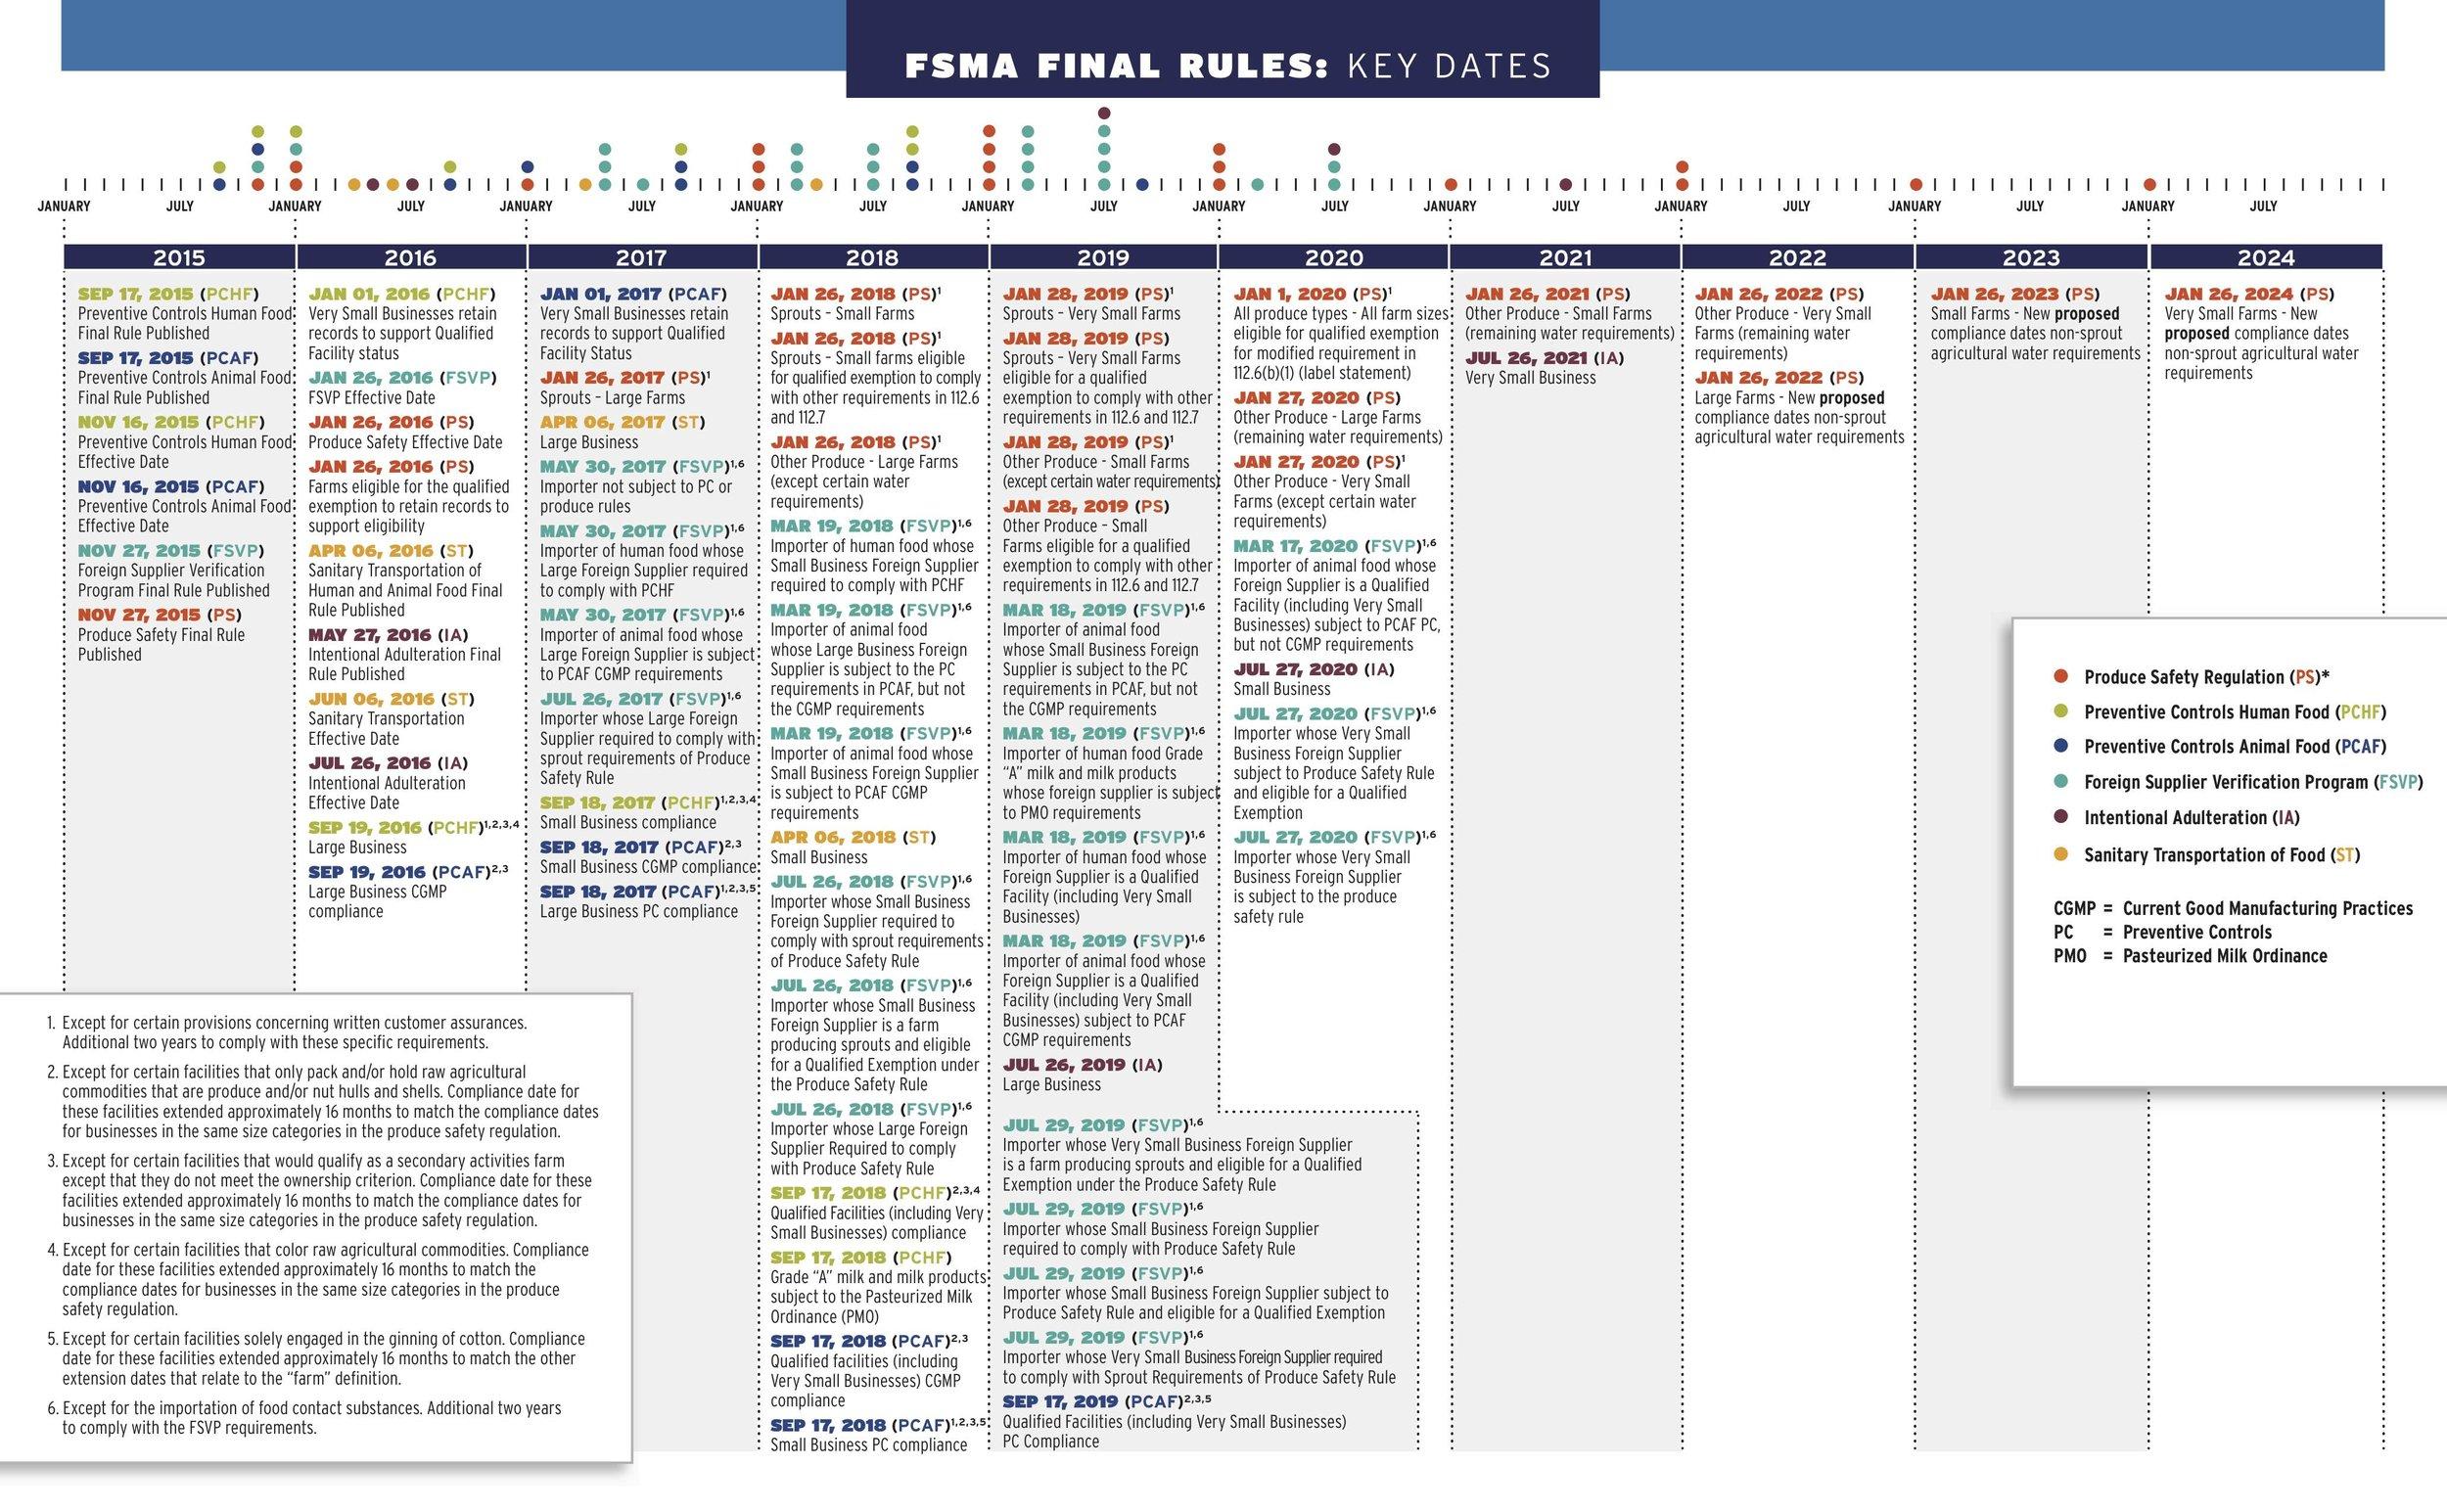 FSMA Compliance Timeline